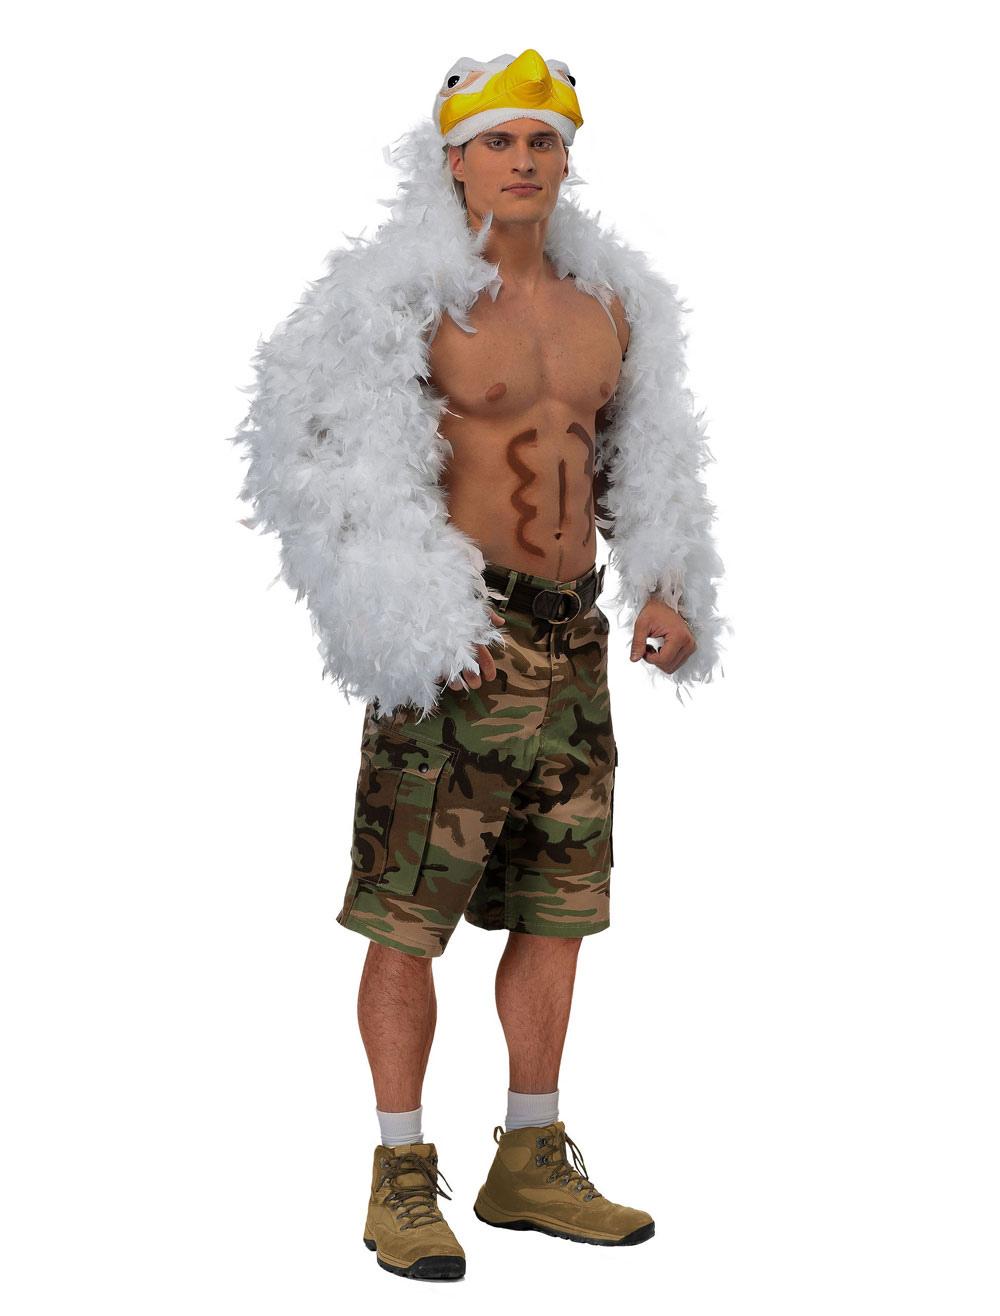 Disfraz De Halloween Para Hombre Disfraz De Halloween Para Hombre - Disfraz-de-halloween-para-hombre